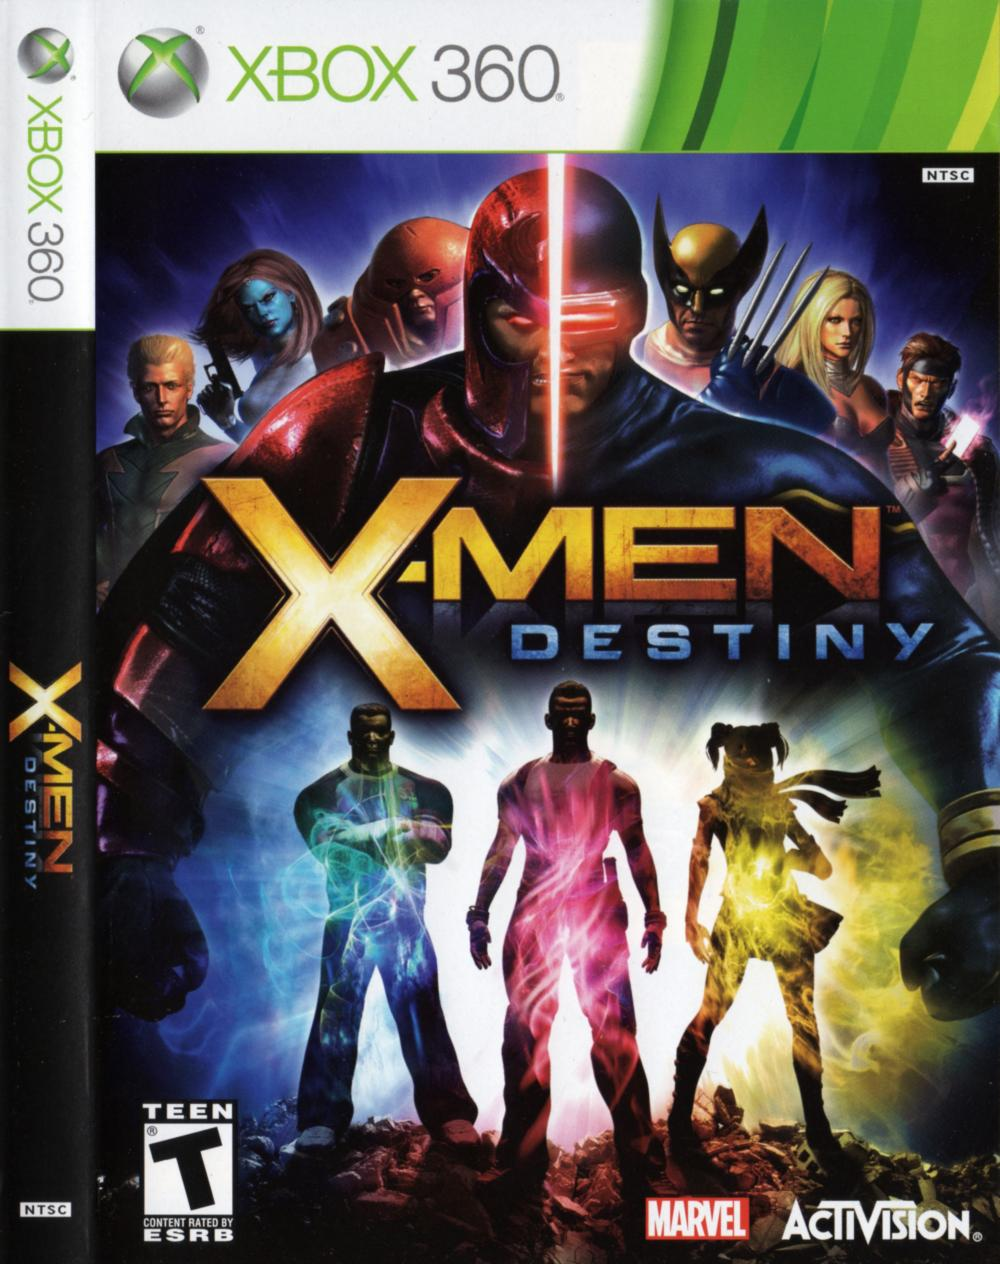 XMEN DESTINY - XBOX360